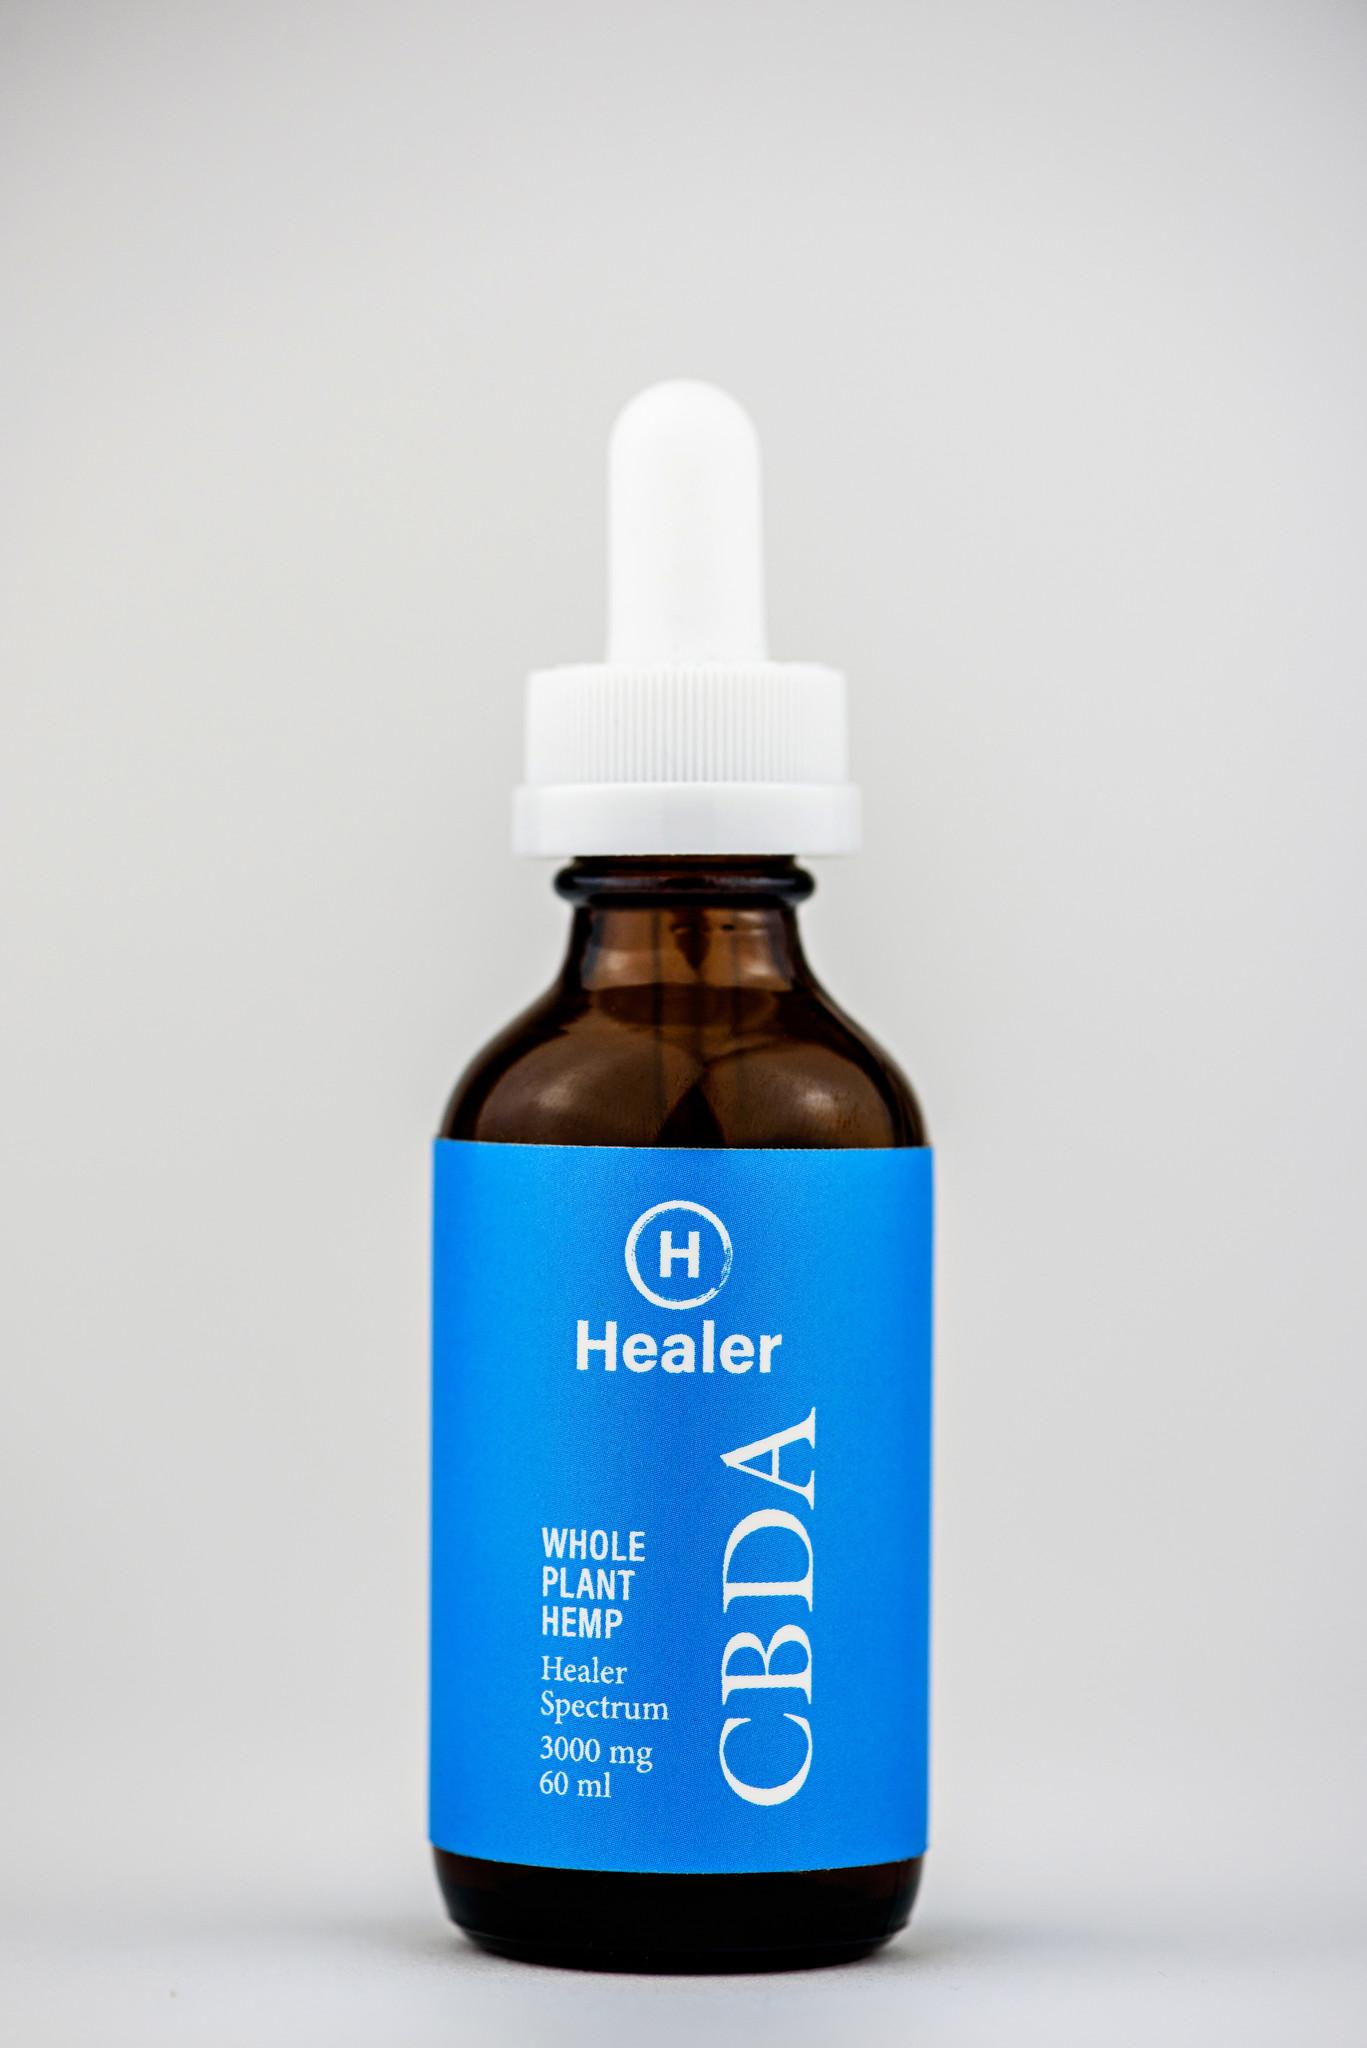 Healer   HEALER   WHOLE PLANT HEMP   CBDA   4 OPTIONS  